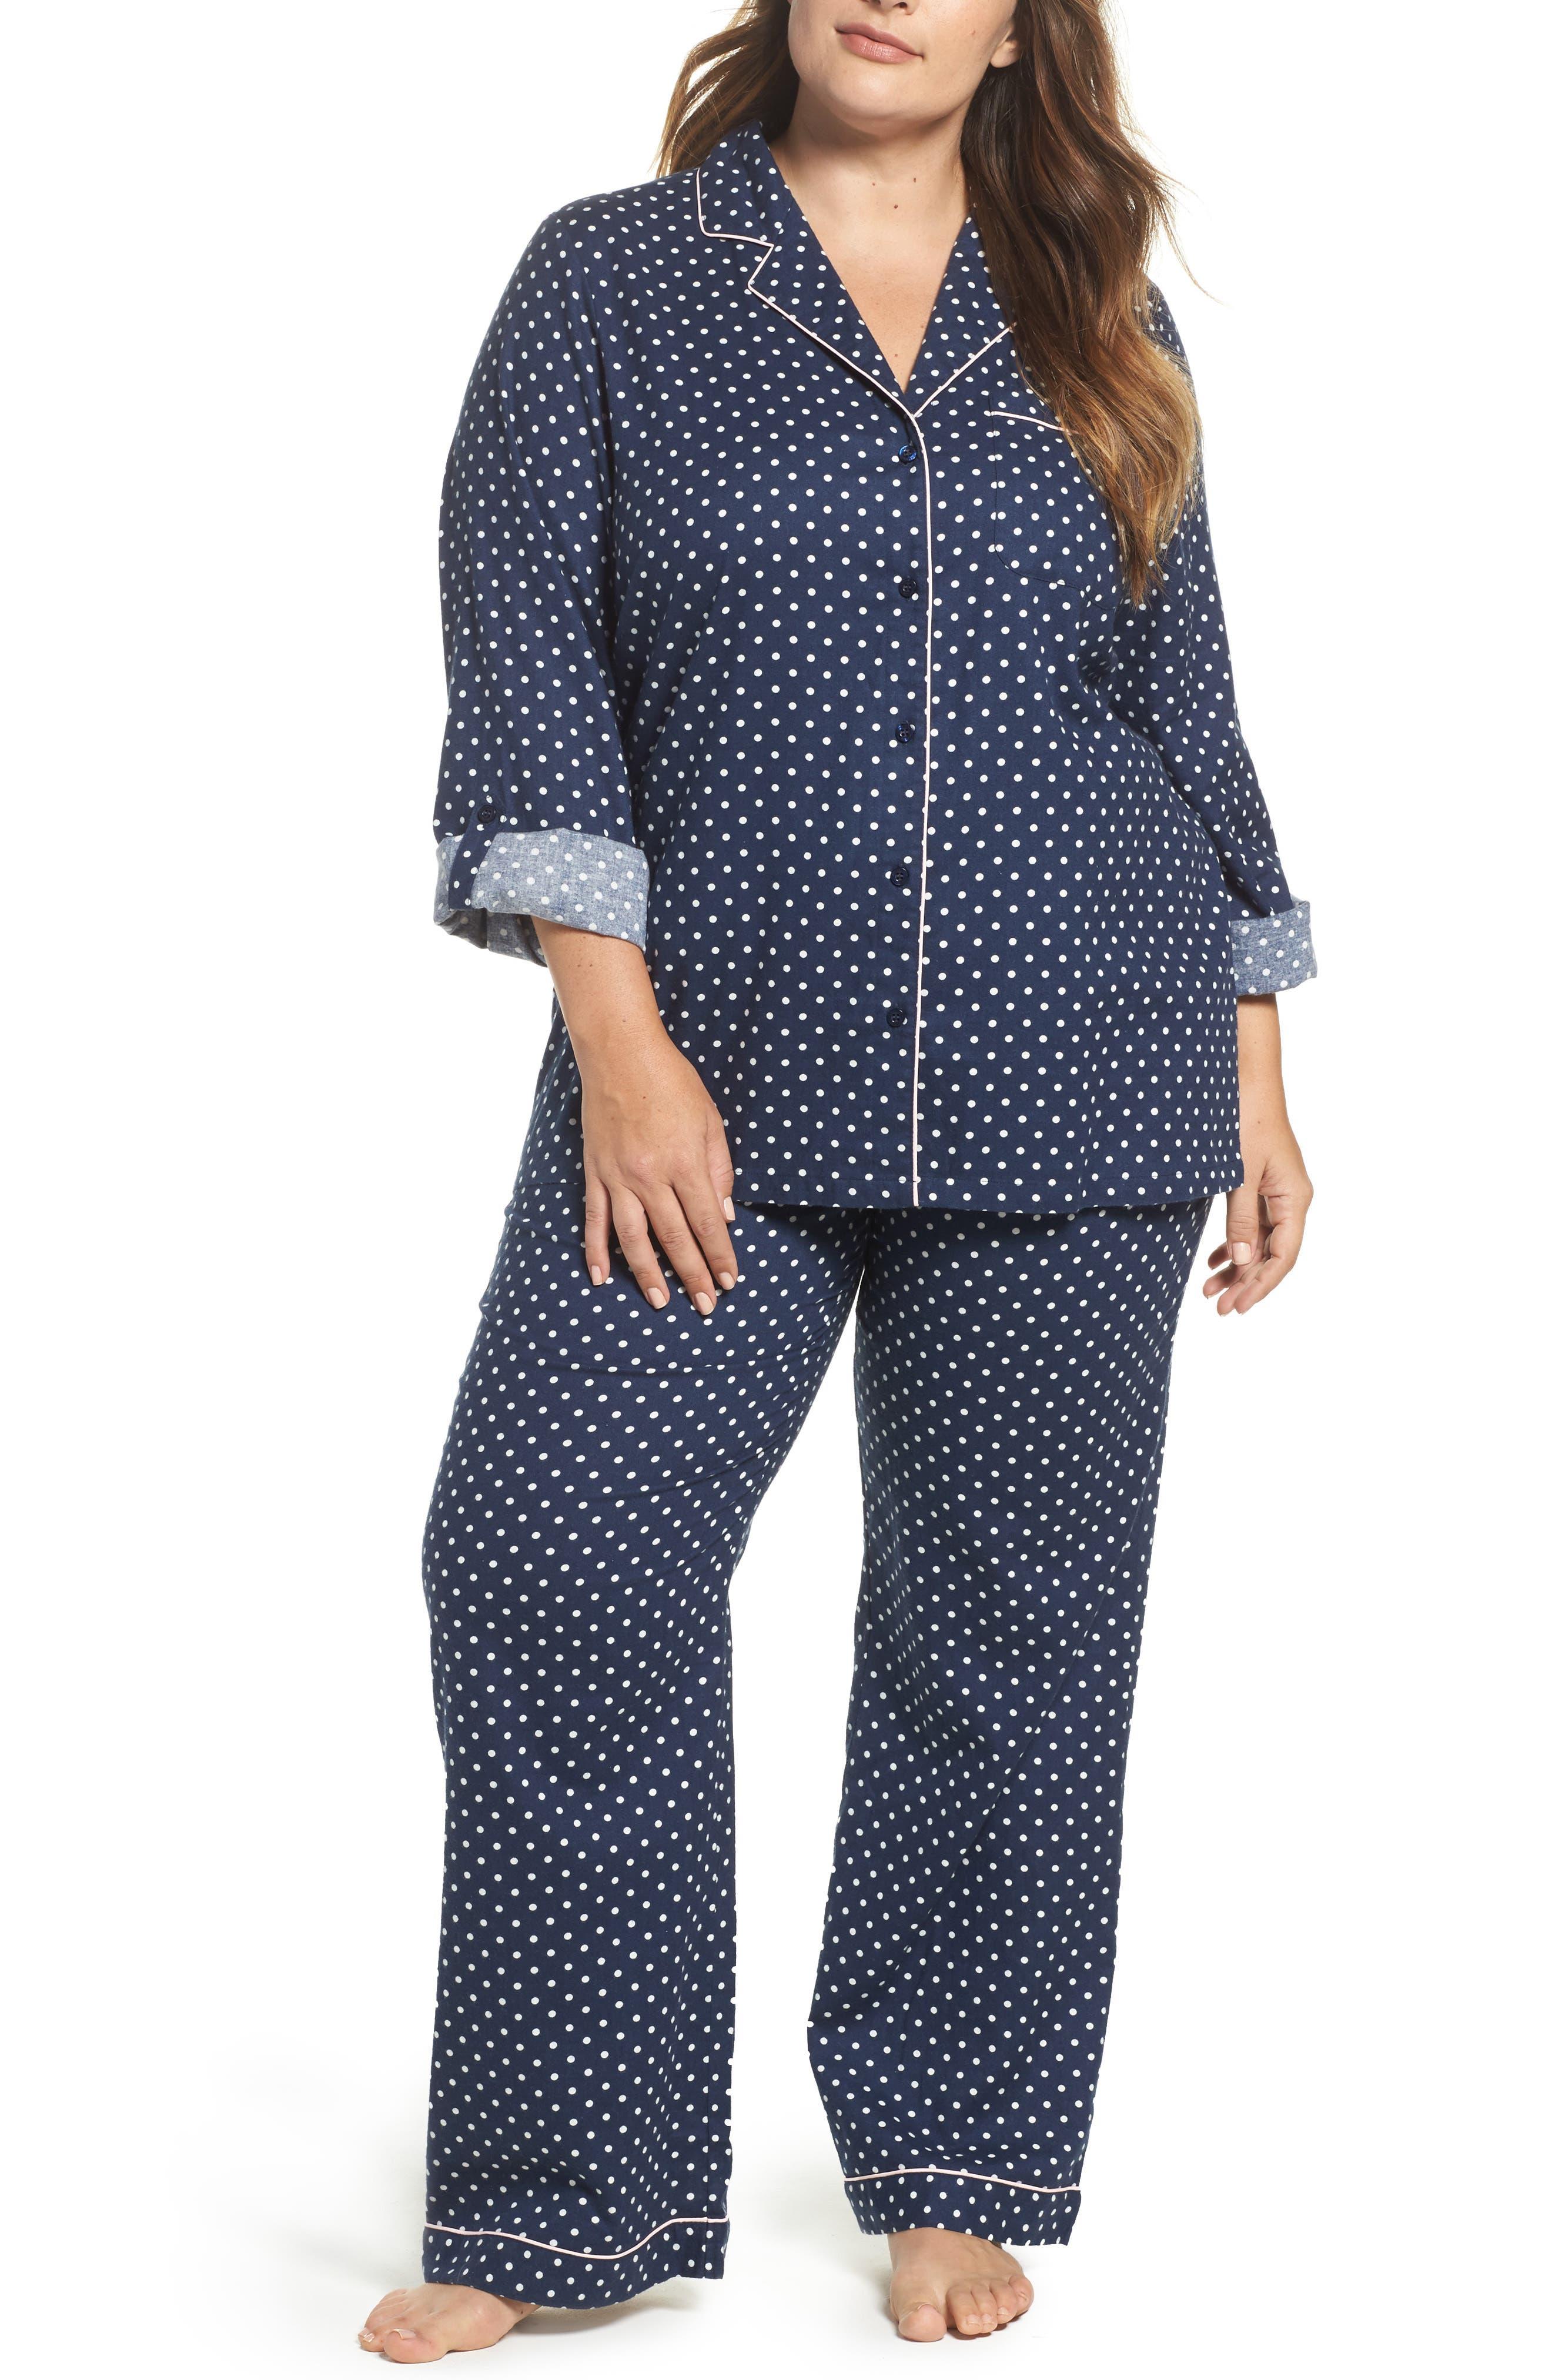 Main Image - Nordstrom Lingerie Cotton Twill Pajamas (Plus Size)